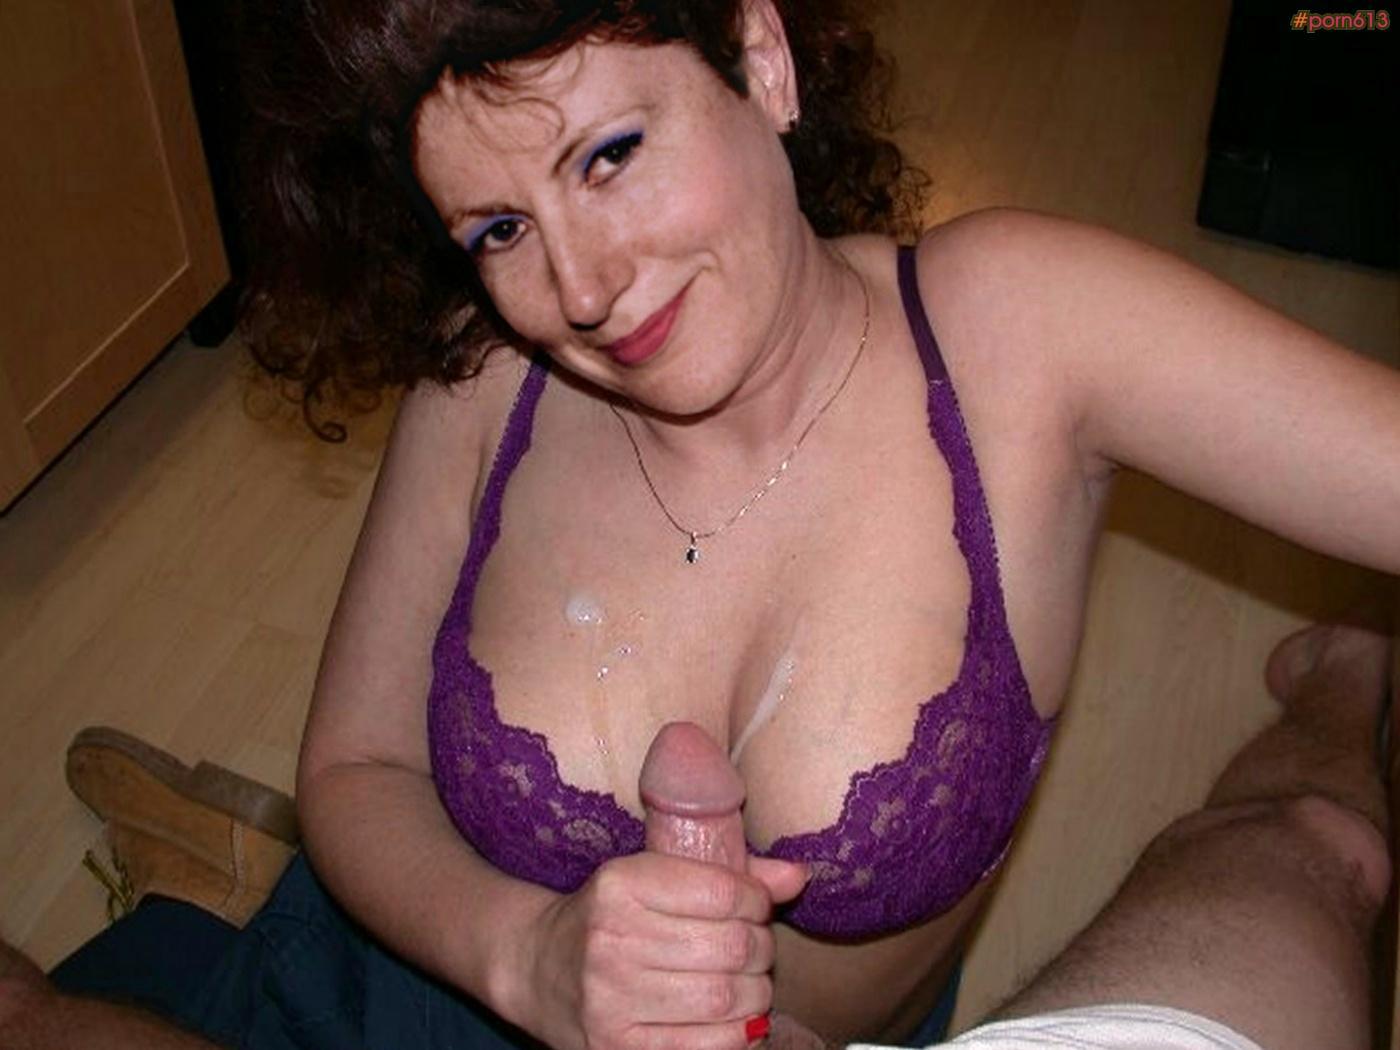 Amateur Handjob Porn Tube handjob milfs   tubezzz porn photos